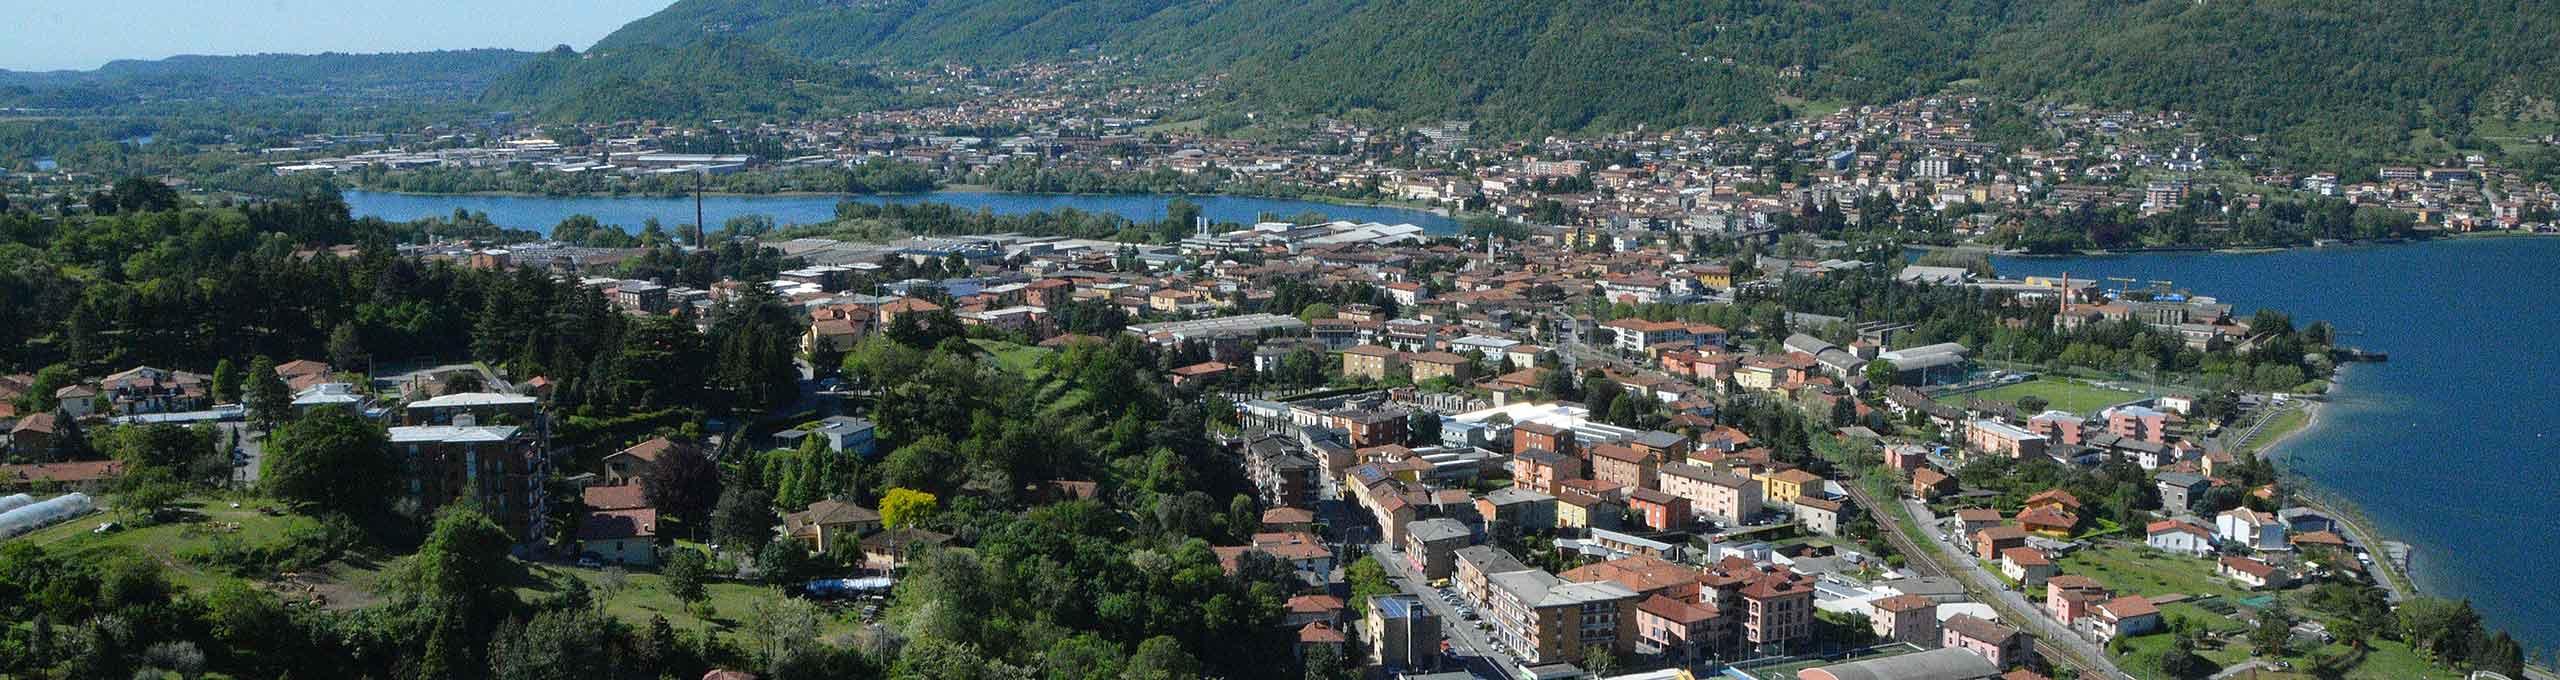 Vercurago, Lago di Como